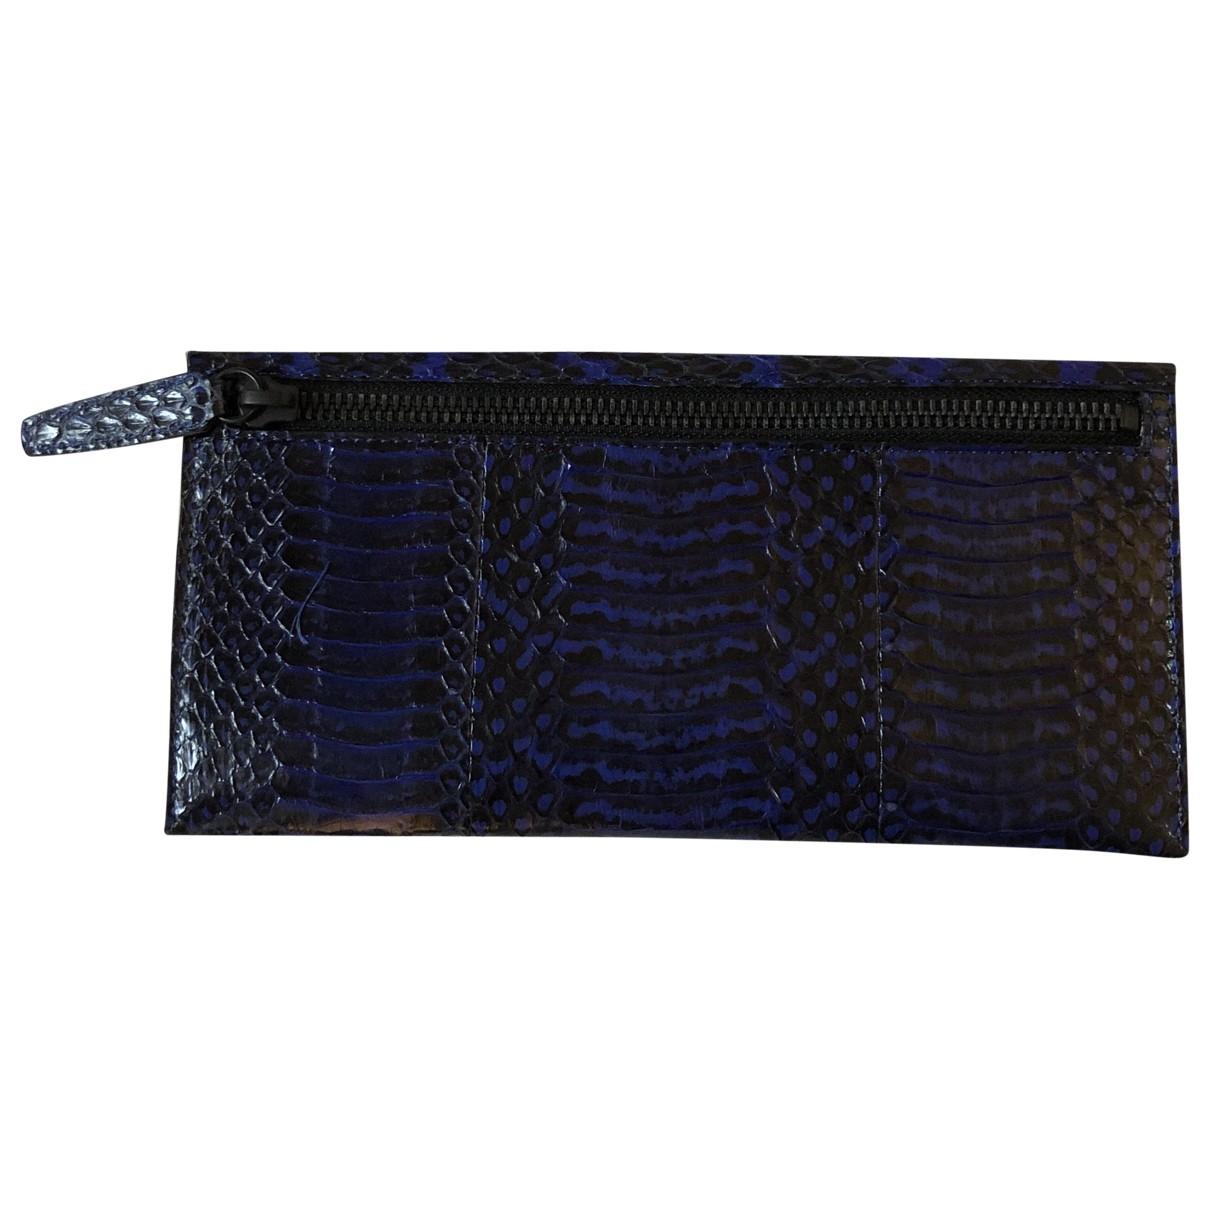 3.1 Phillip Lim \N Blue Python wallet for Women \N